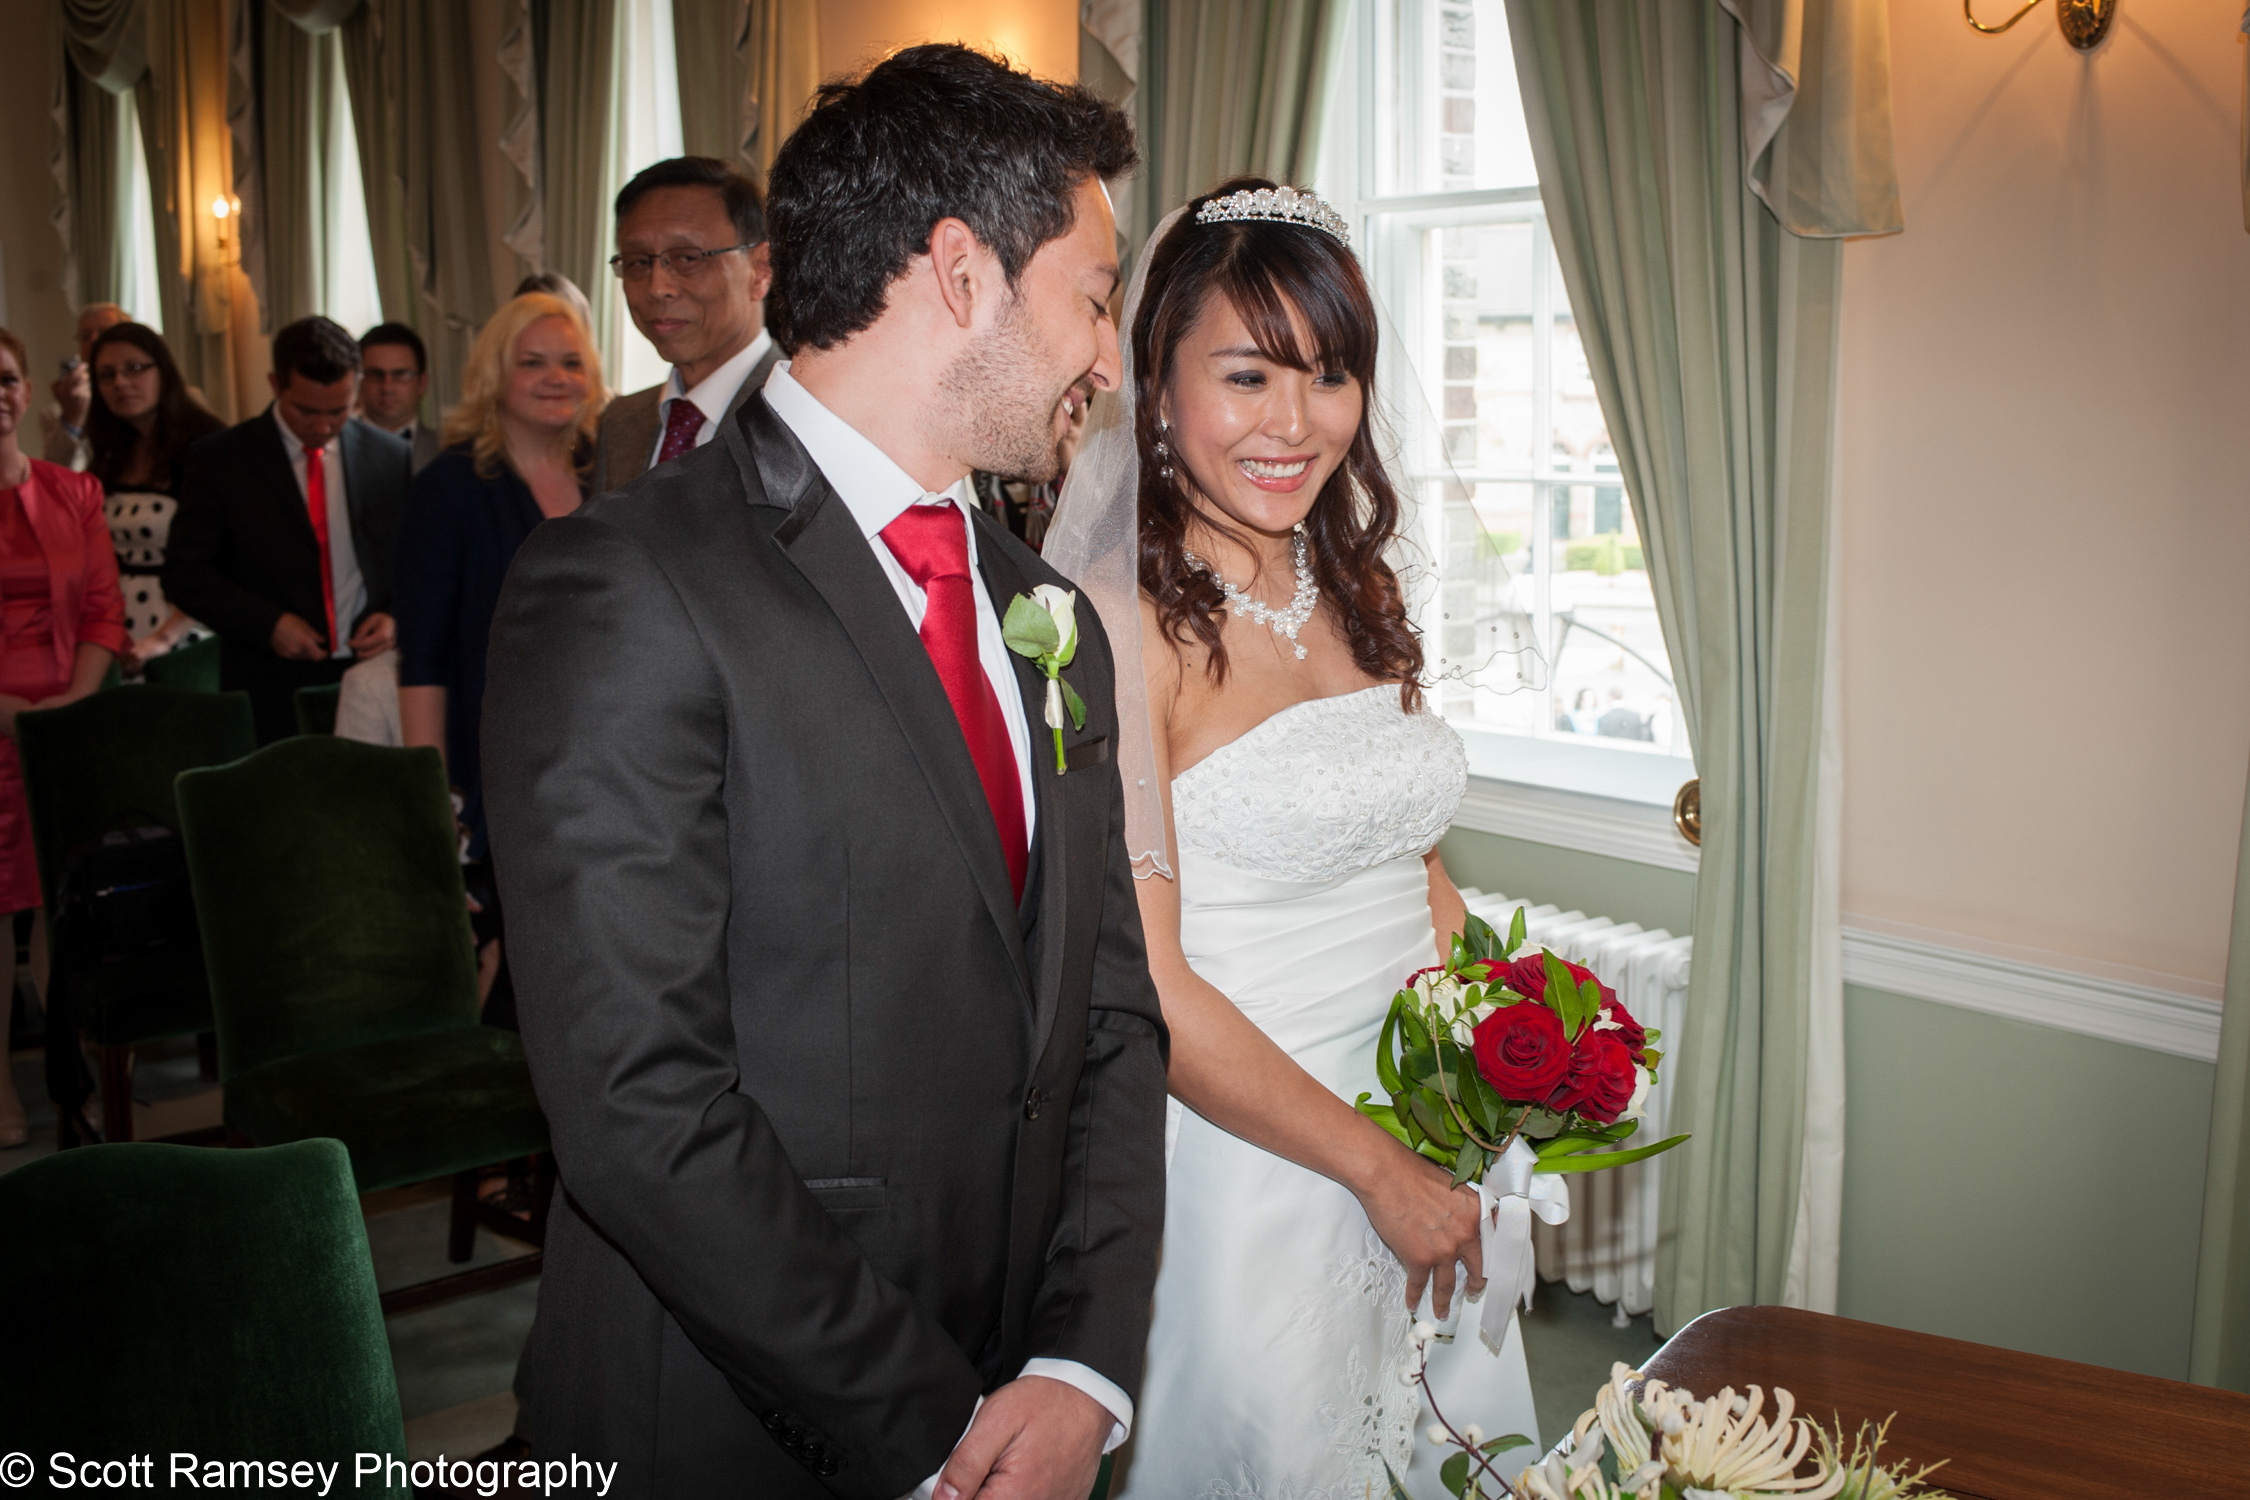 Portsmouth Registry Office Wedding Groom And Bride 040513-10